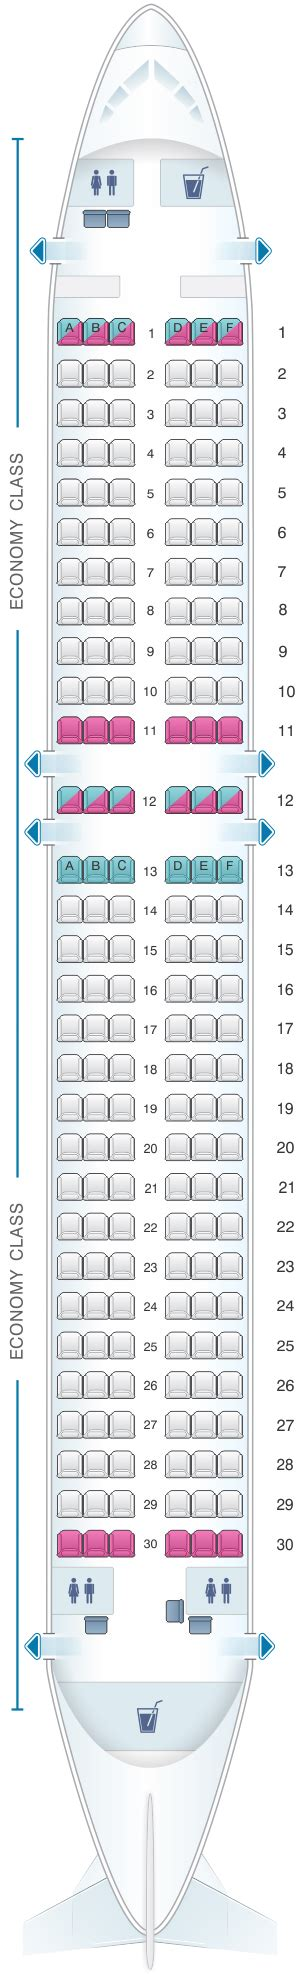 plan des sieges airbus a320 plan de cabine freebird airlines airbus a320 seatmaestro fr